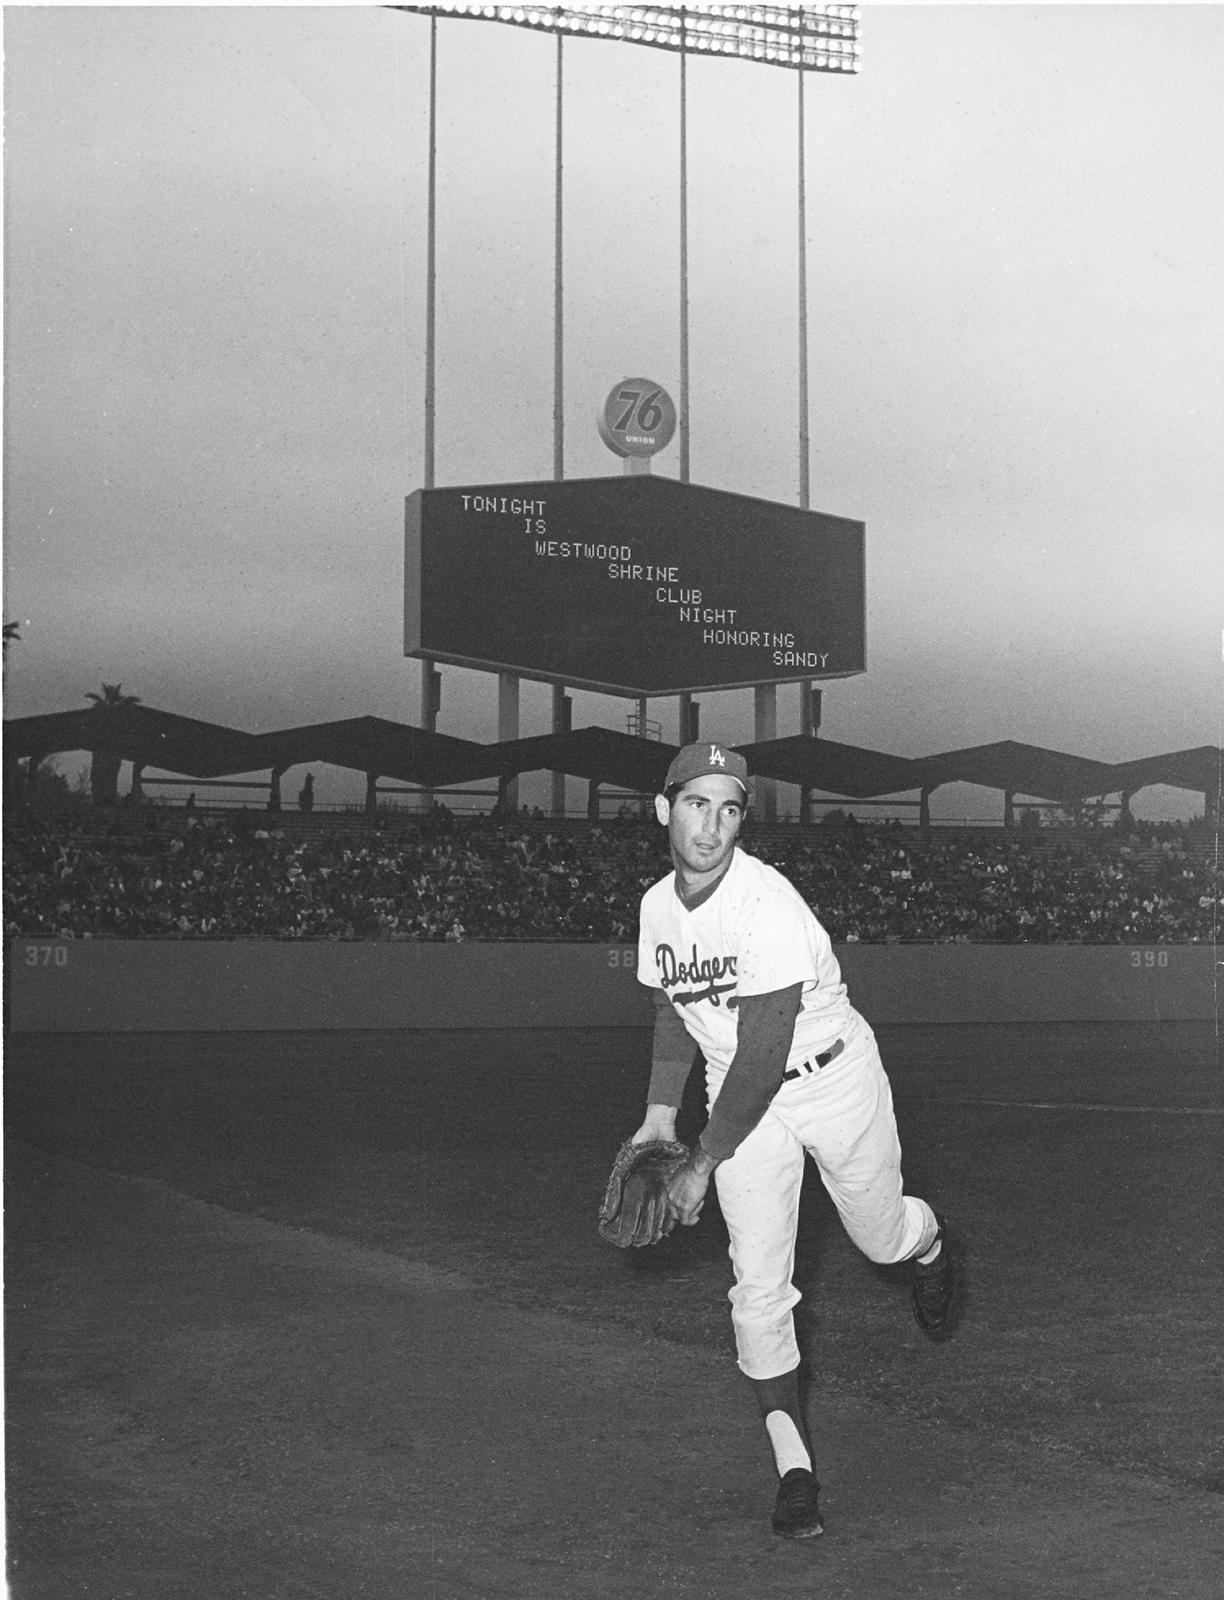 Sandy Koufax pitching at Dodger Stadium in 1964